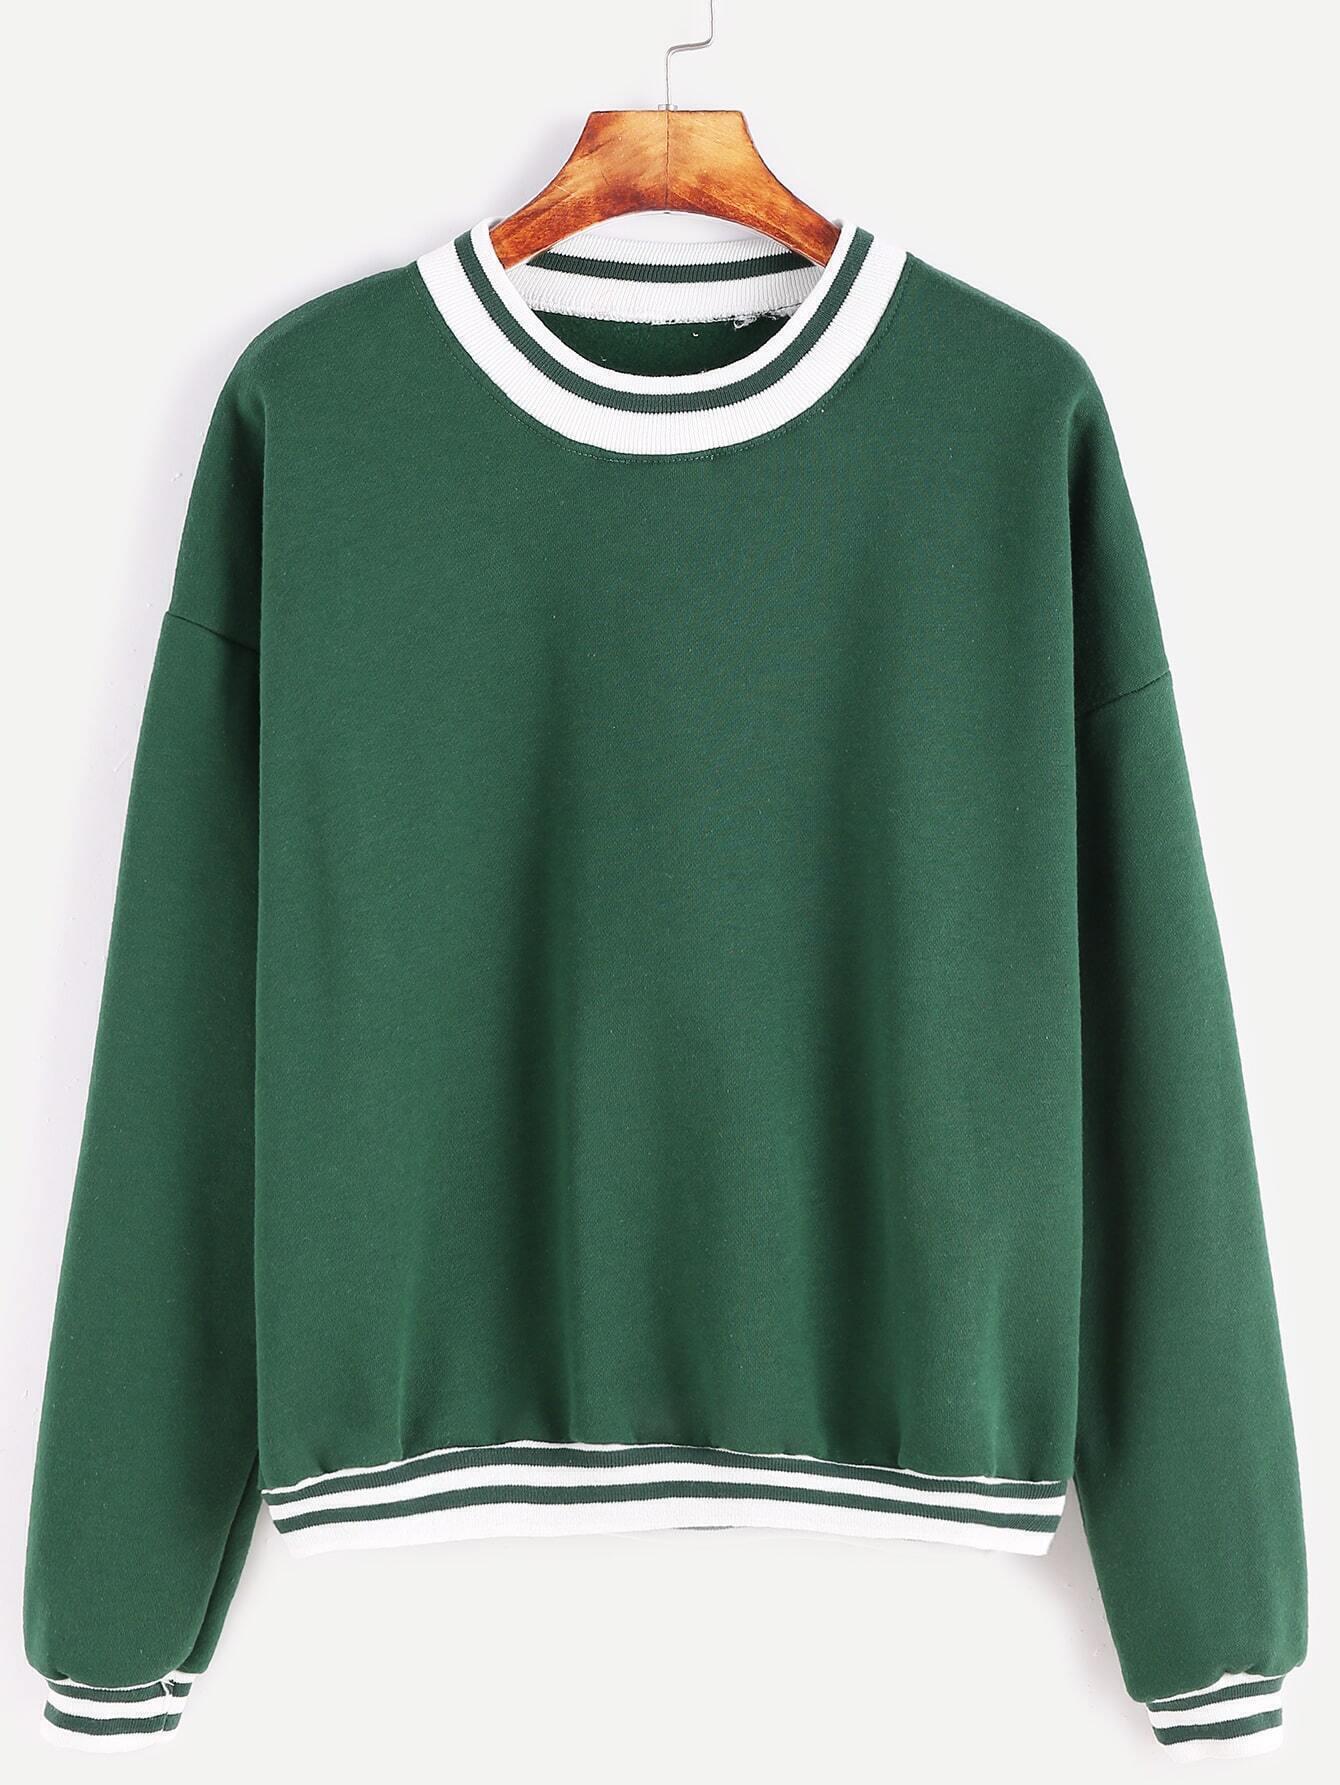 Green Contrast Striped Trim Dropped Shoulder Seam Sweatshirt